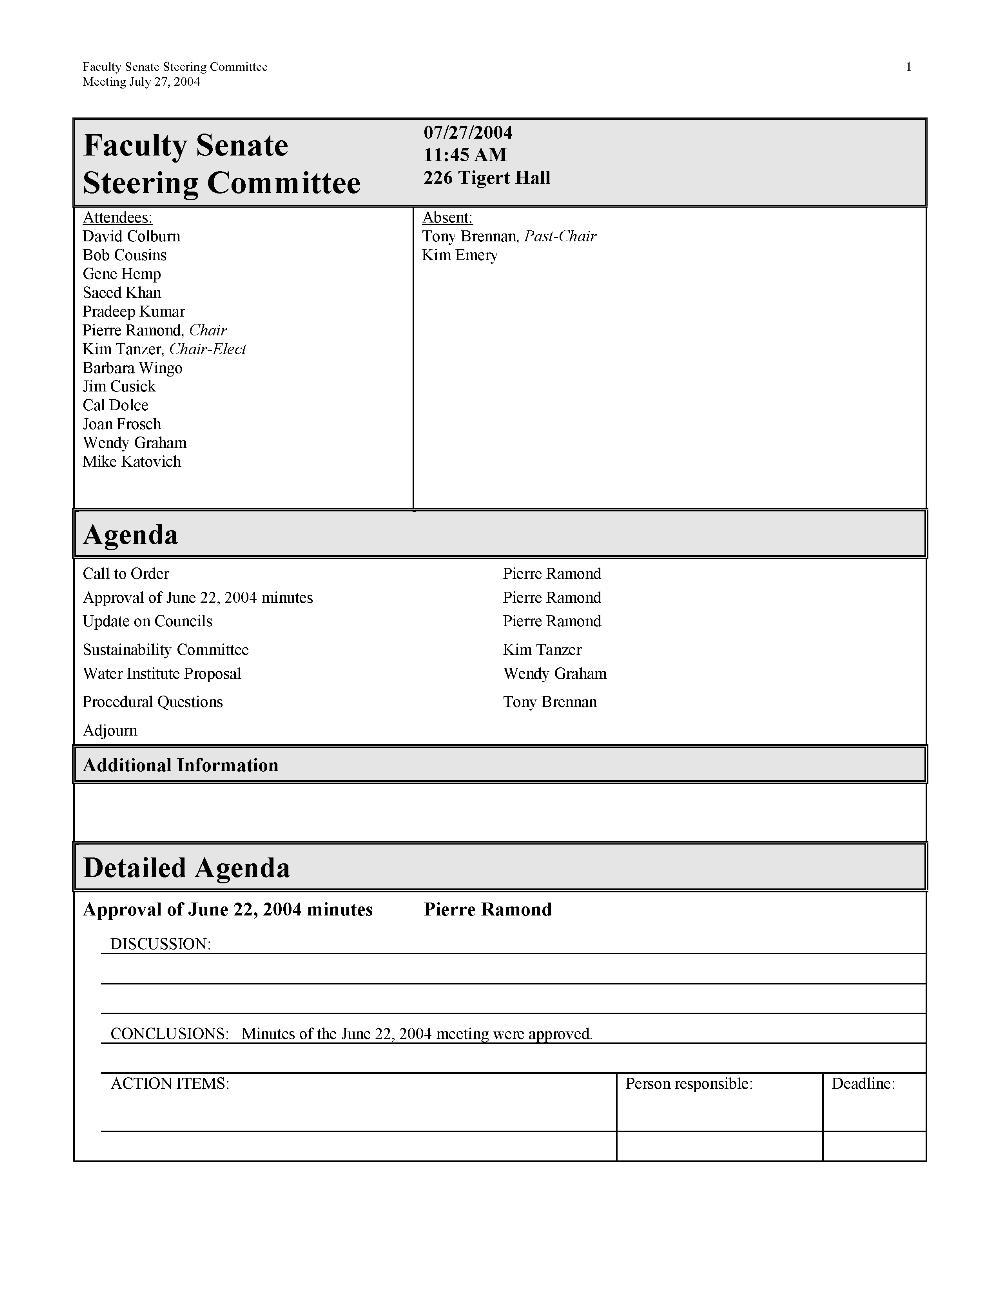 Faculty Senate Steering Committee meeting minutes - Page 1